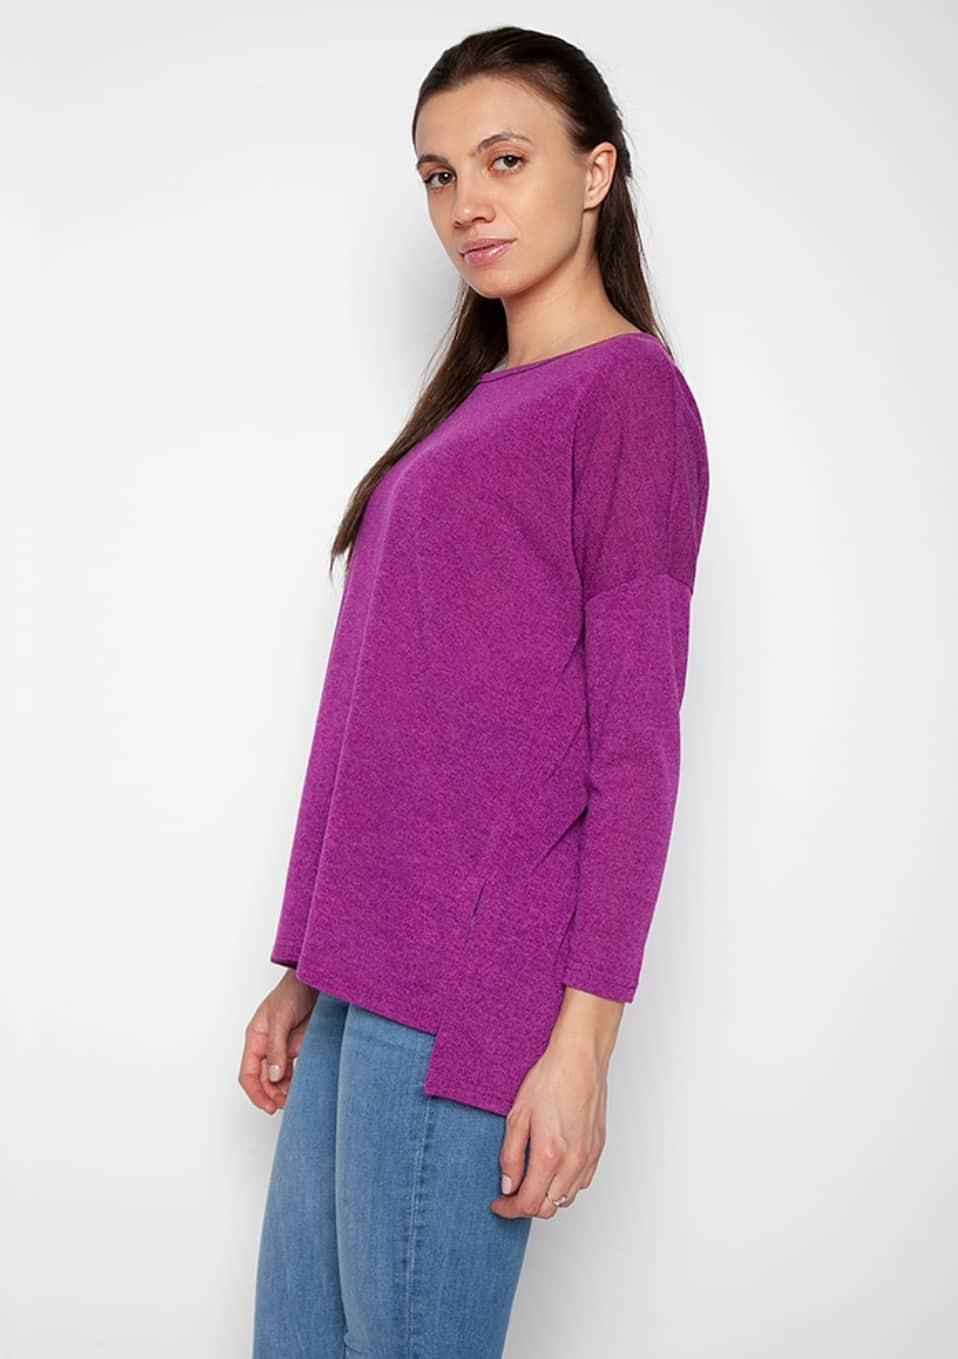 a37852927d28 Γυναικεία μπλούζα ασύμμετρη μακρυμάνικη μωβ σε άνετη γραμμή